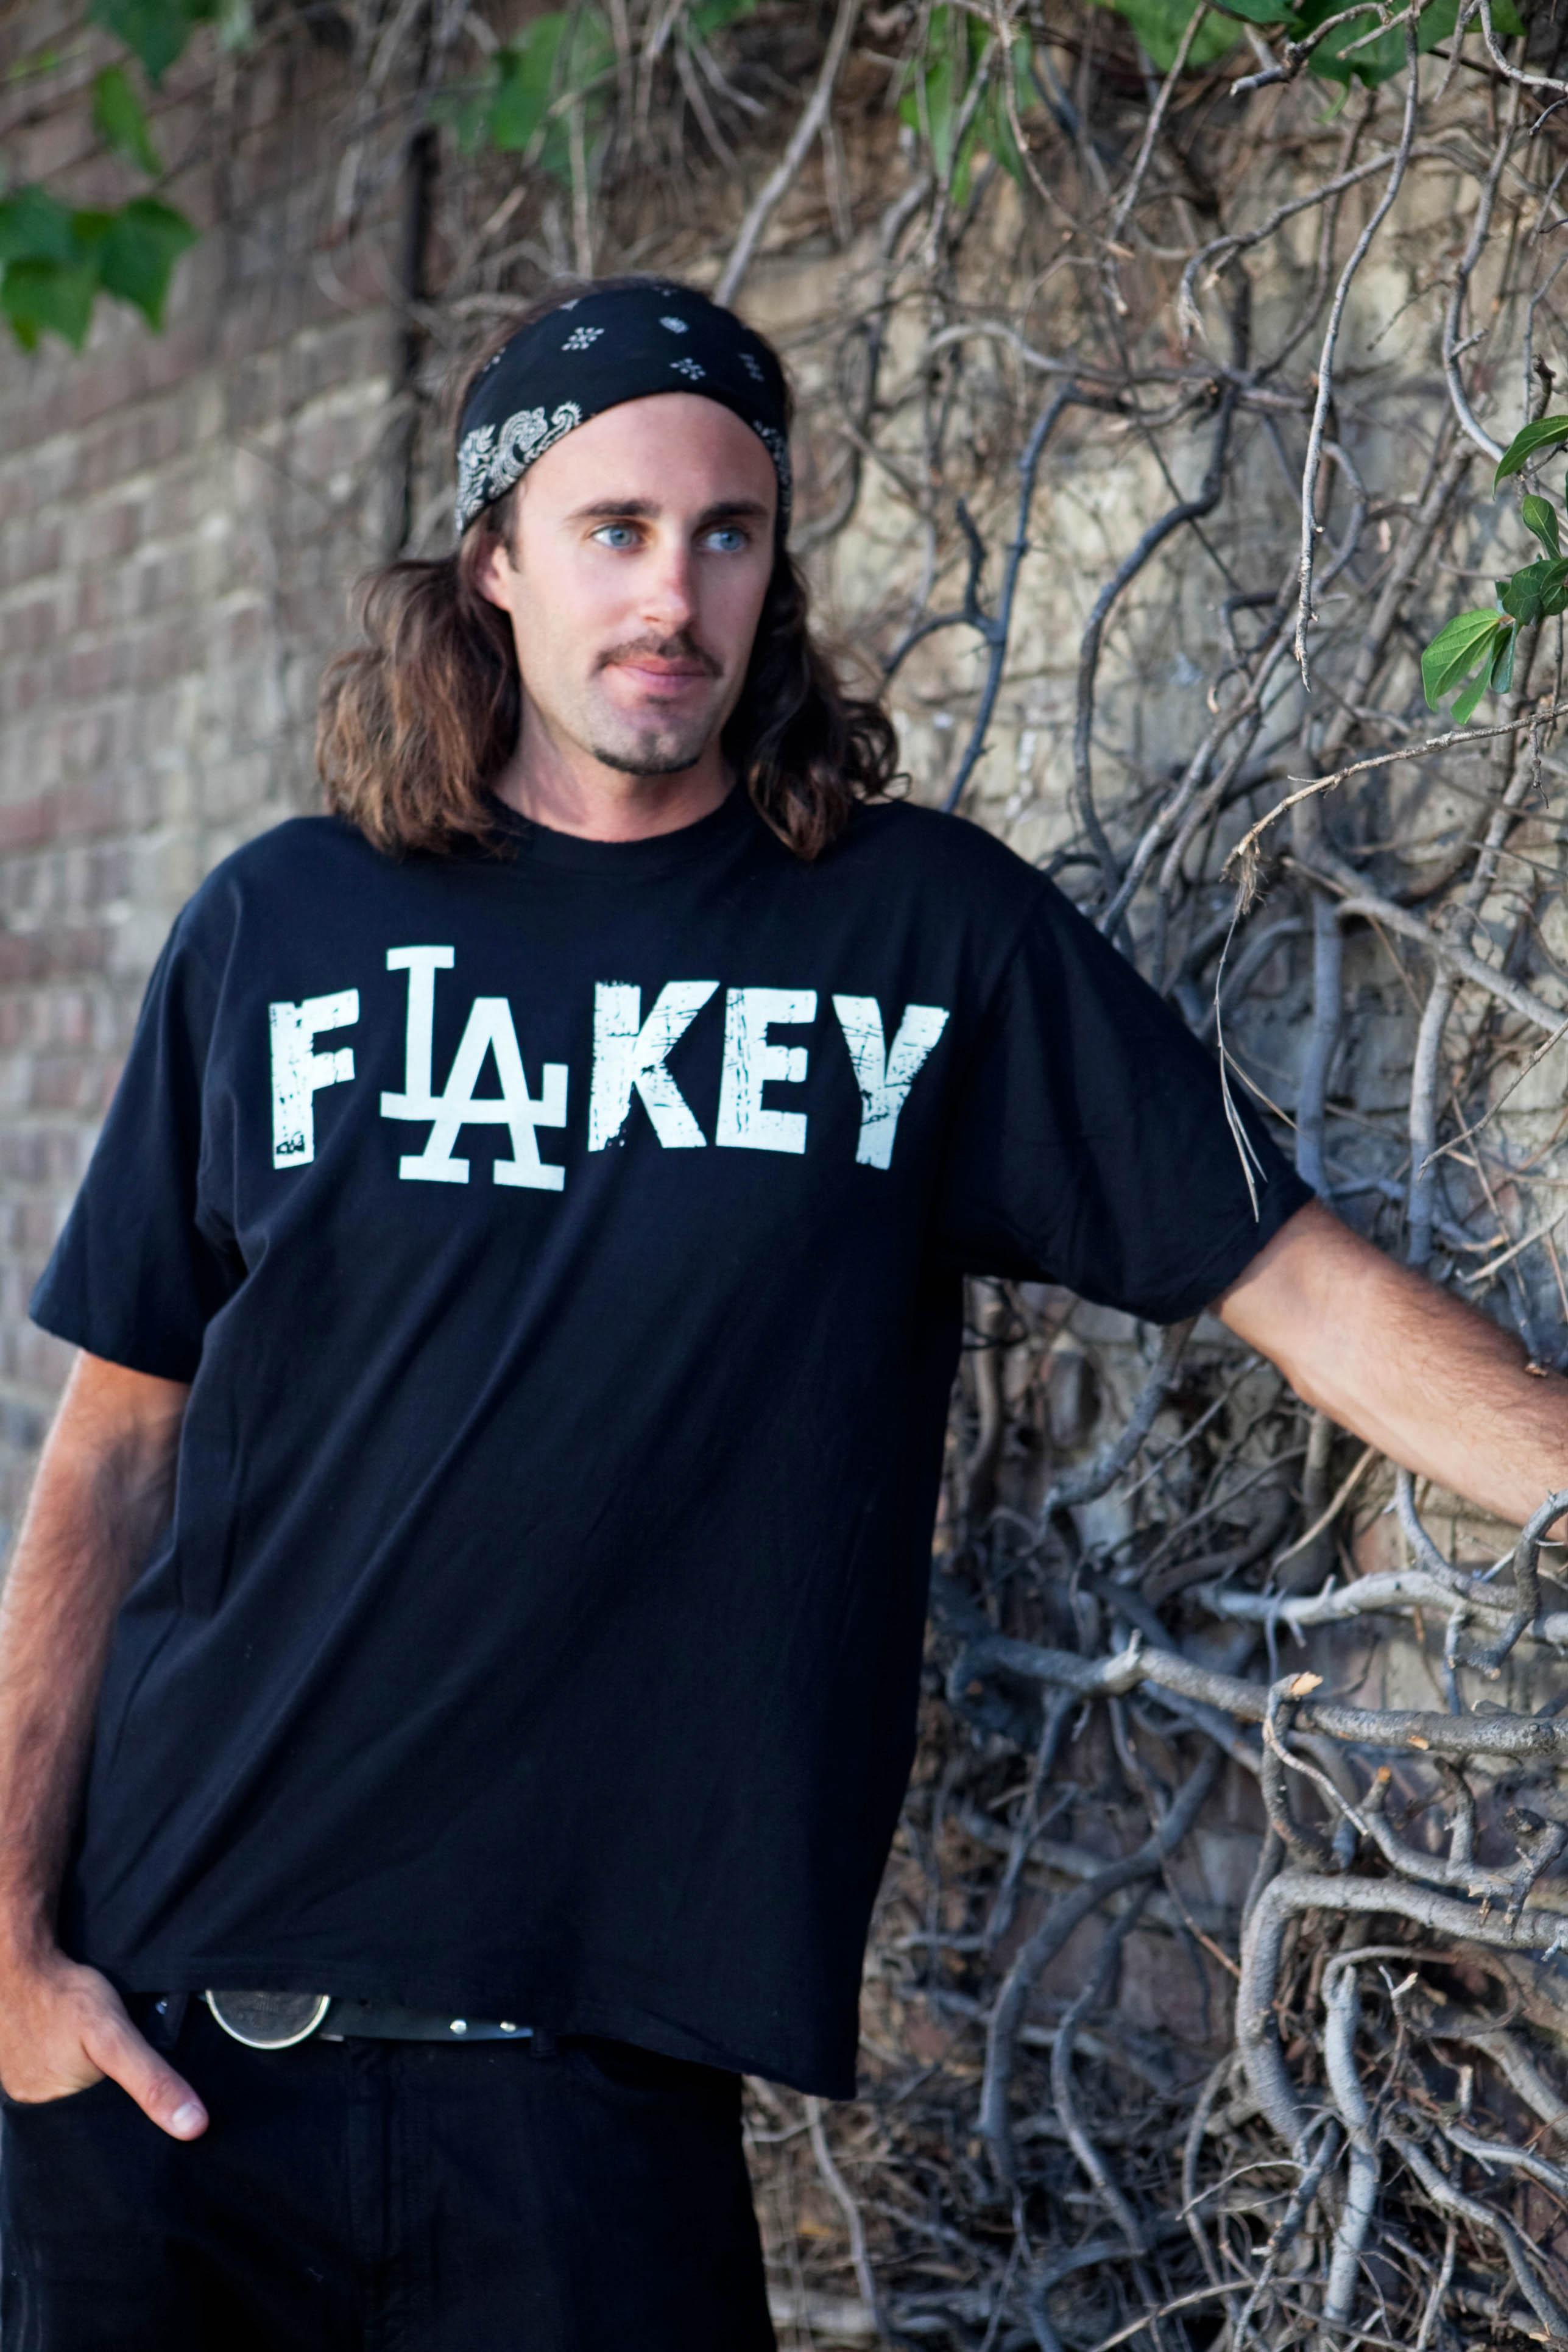 Storenvy coupon: fLAkey